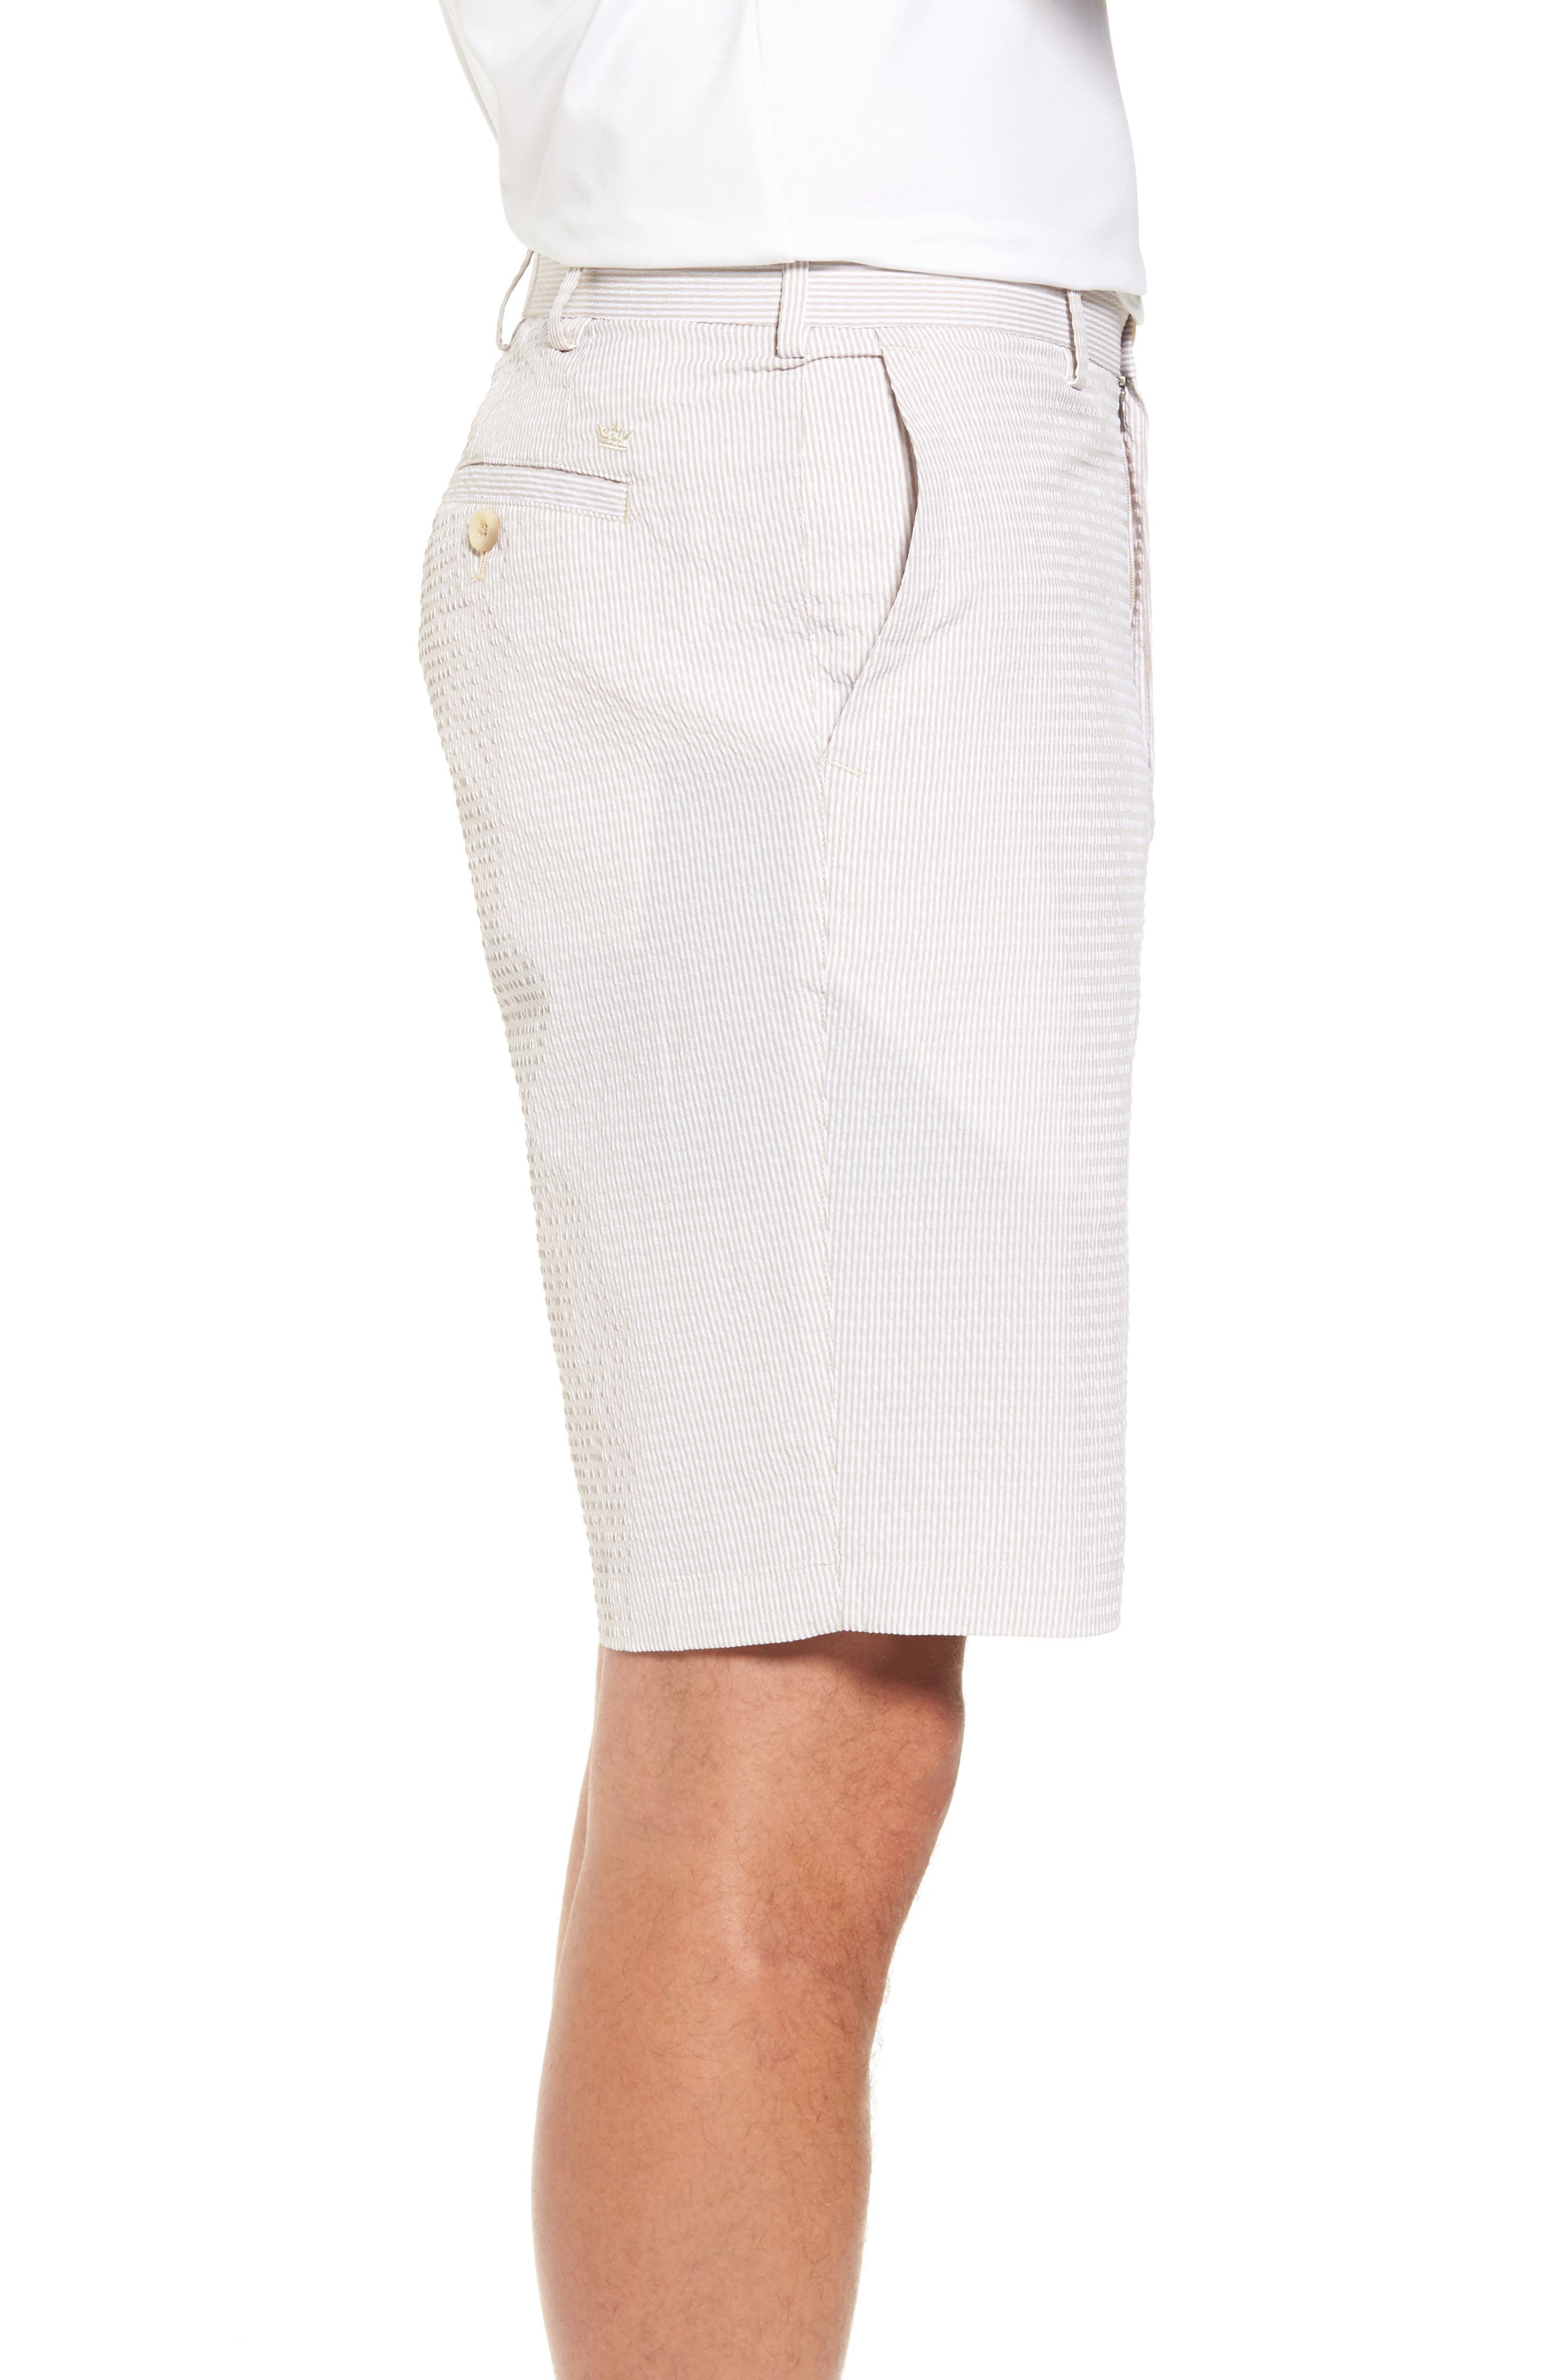 Apex Pinstripe Seersucker Shorts,                             Alternate thumbnail 3, color,                             260